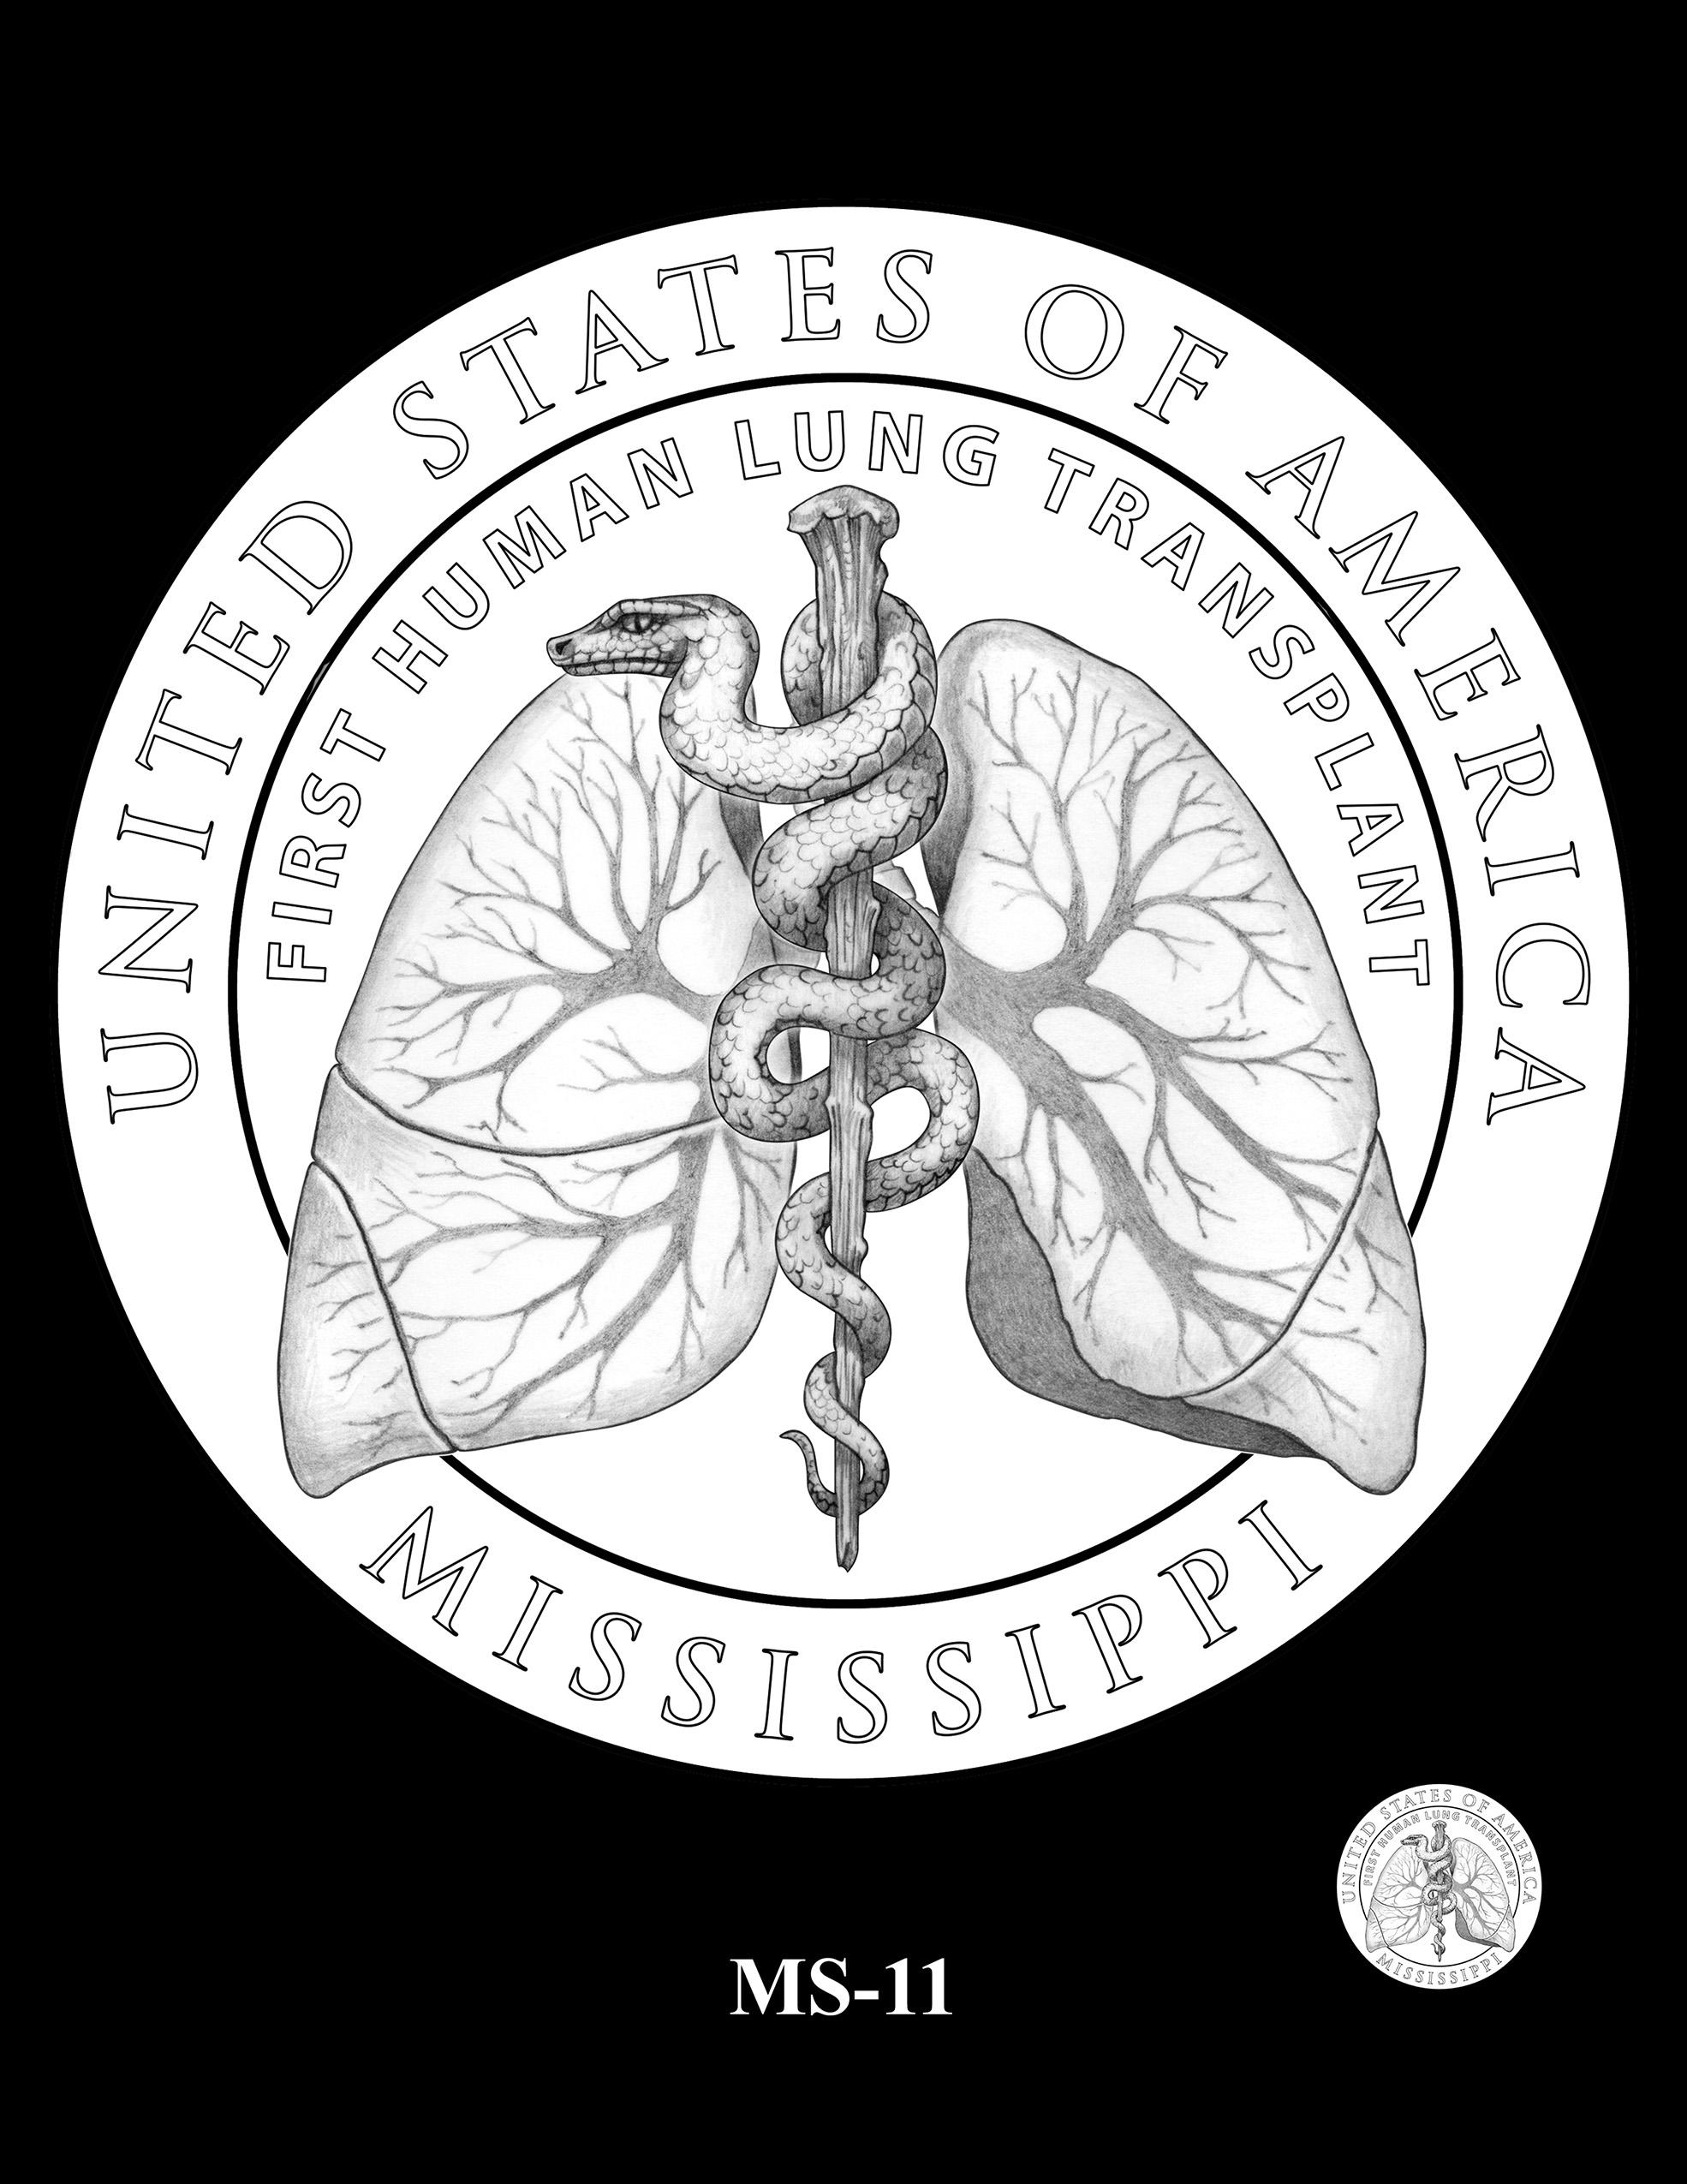 MS-11 -- 2023 American Innovation $1 Coin Program - Mississippi